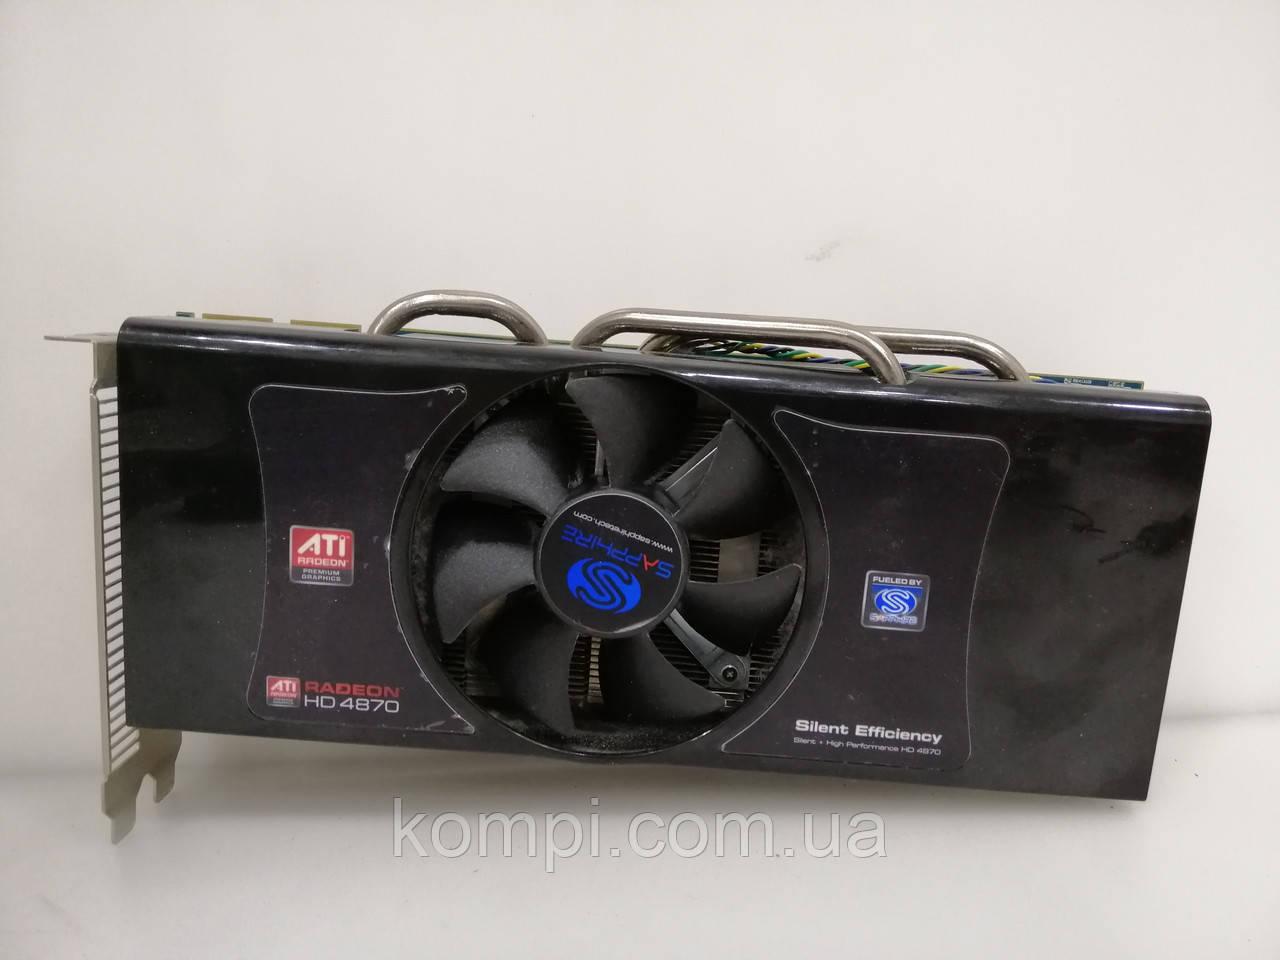 Видеокарта ATI RADEON HD 4870 1gb PCI-E